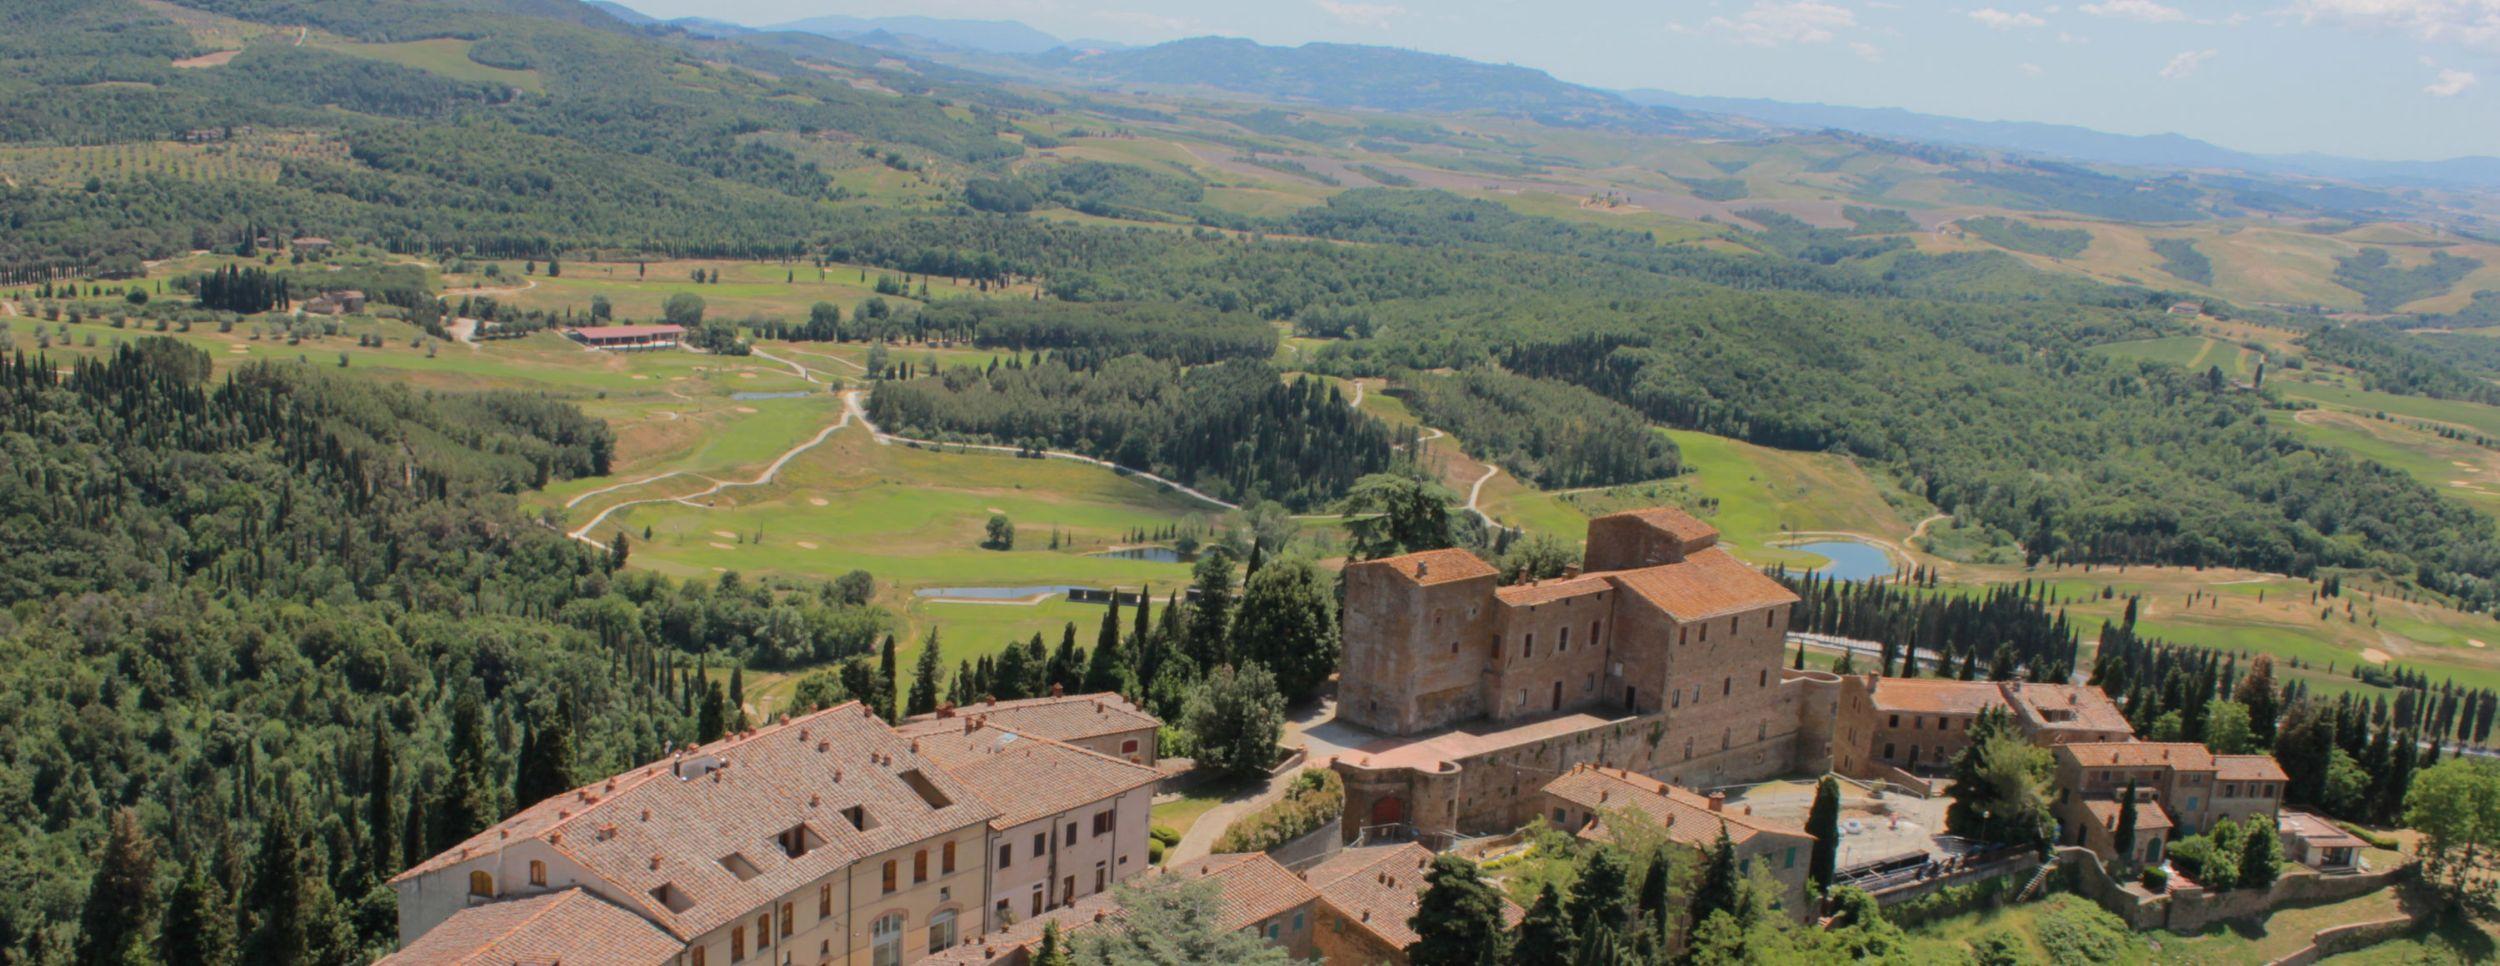 golf-expedition-golfreizen-italie-heerlijk-golfen-mooiste-golfbanen